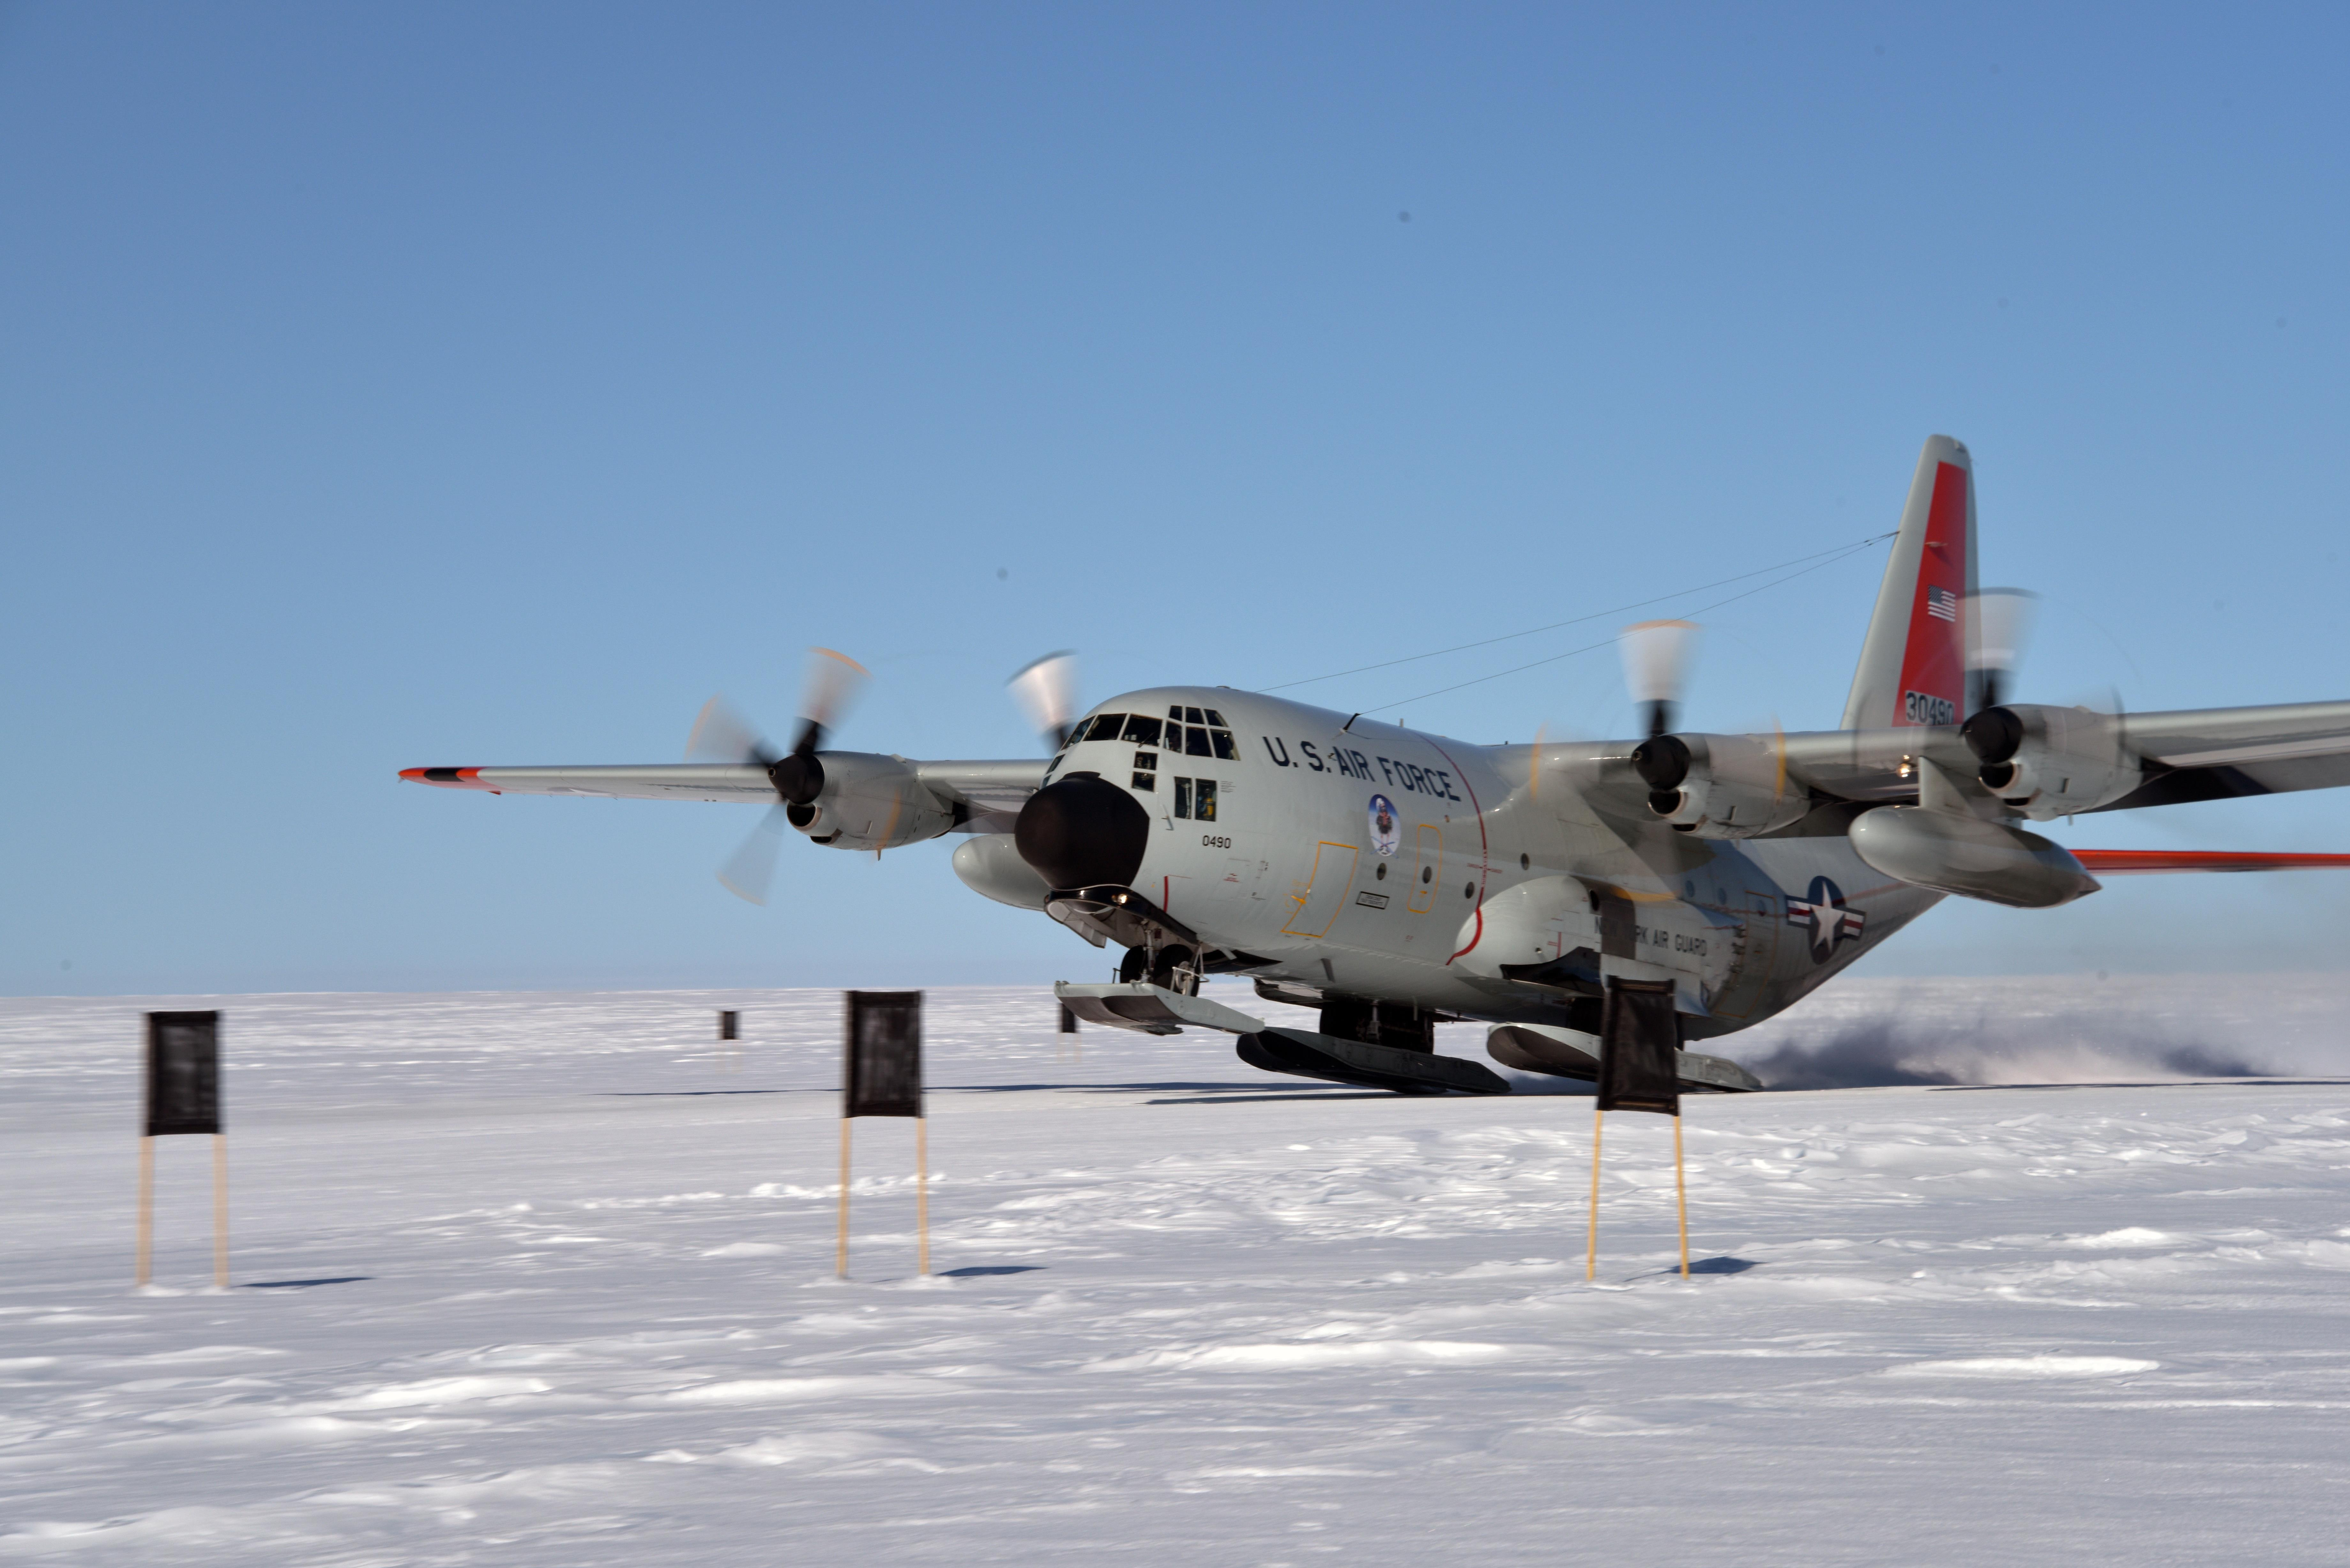 LC-130 Skibird Aircrews Train For Polar Operations > U.S